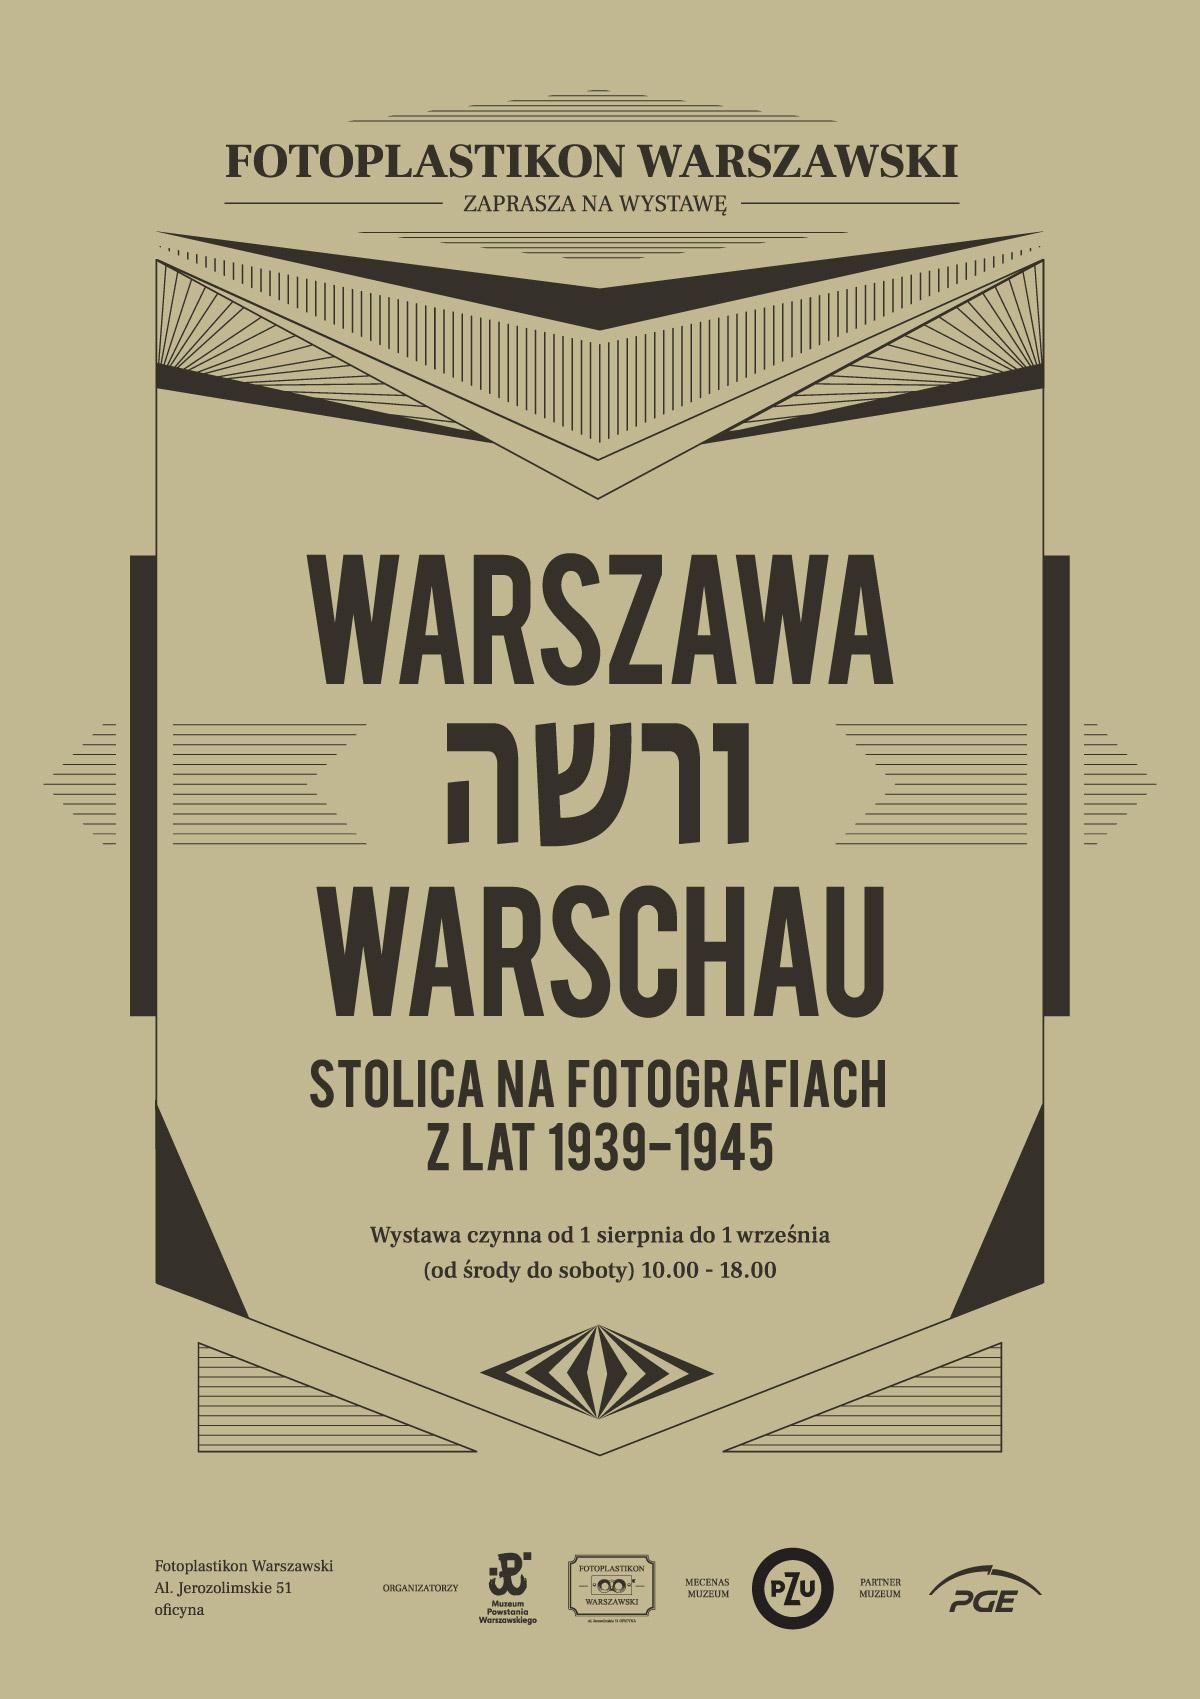 Fotoplastikon-Warszawa-Warschau-2018-08 (2)